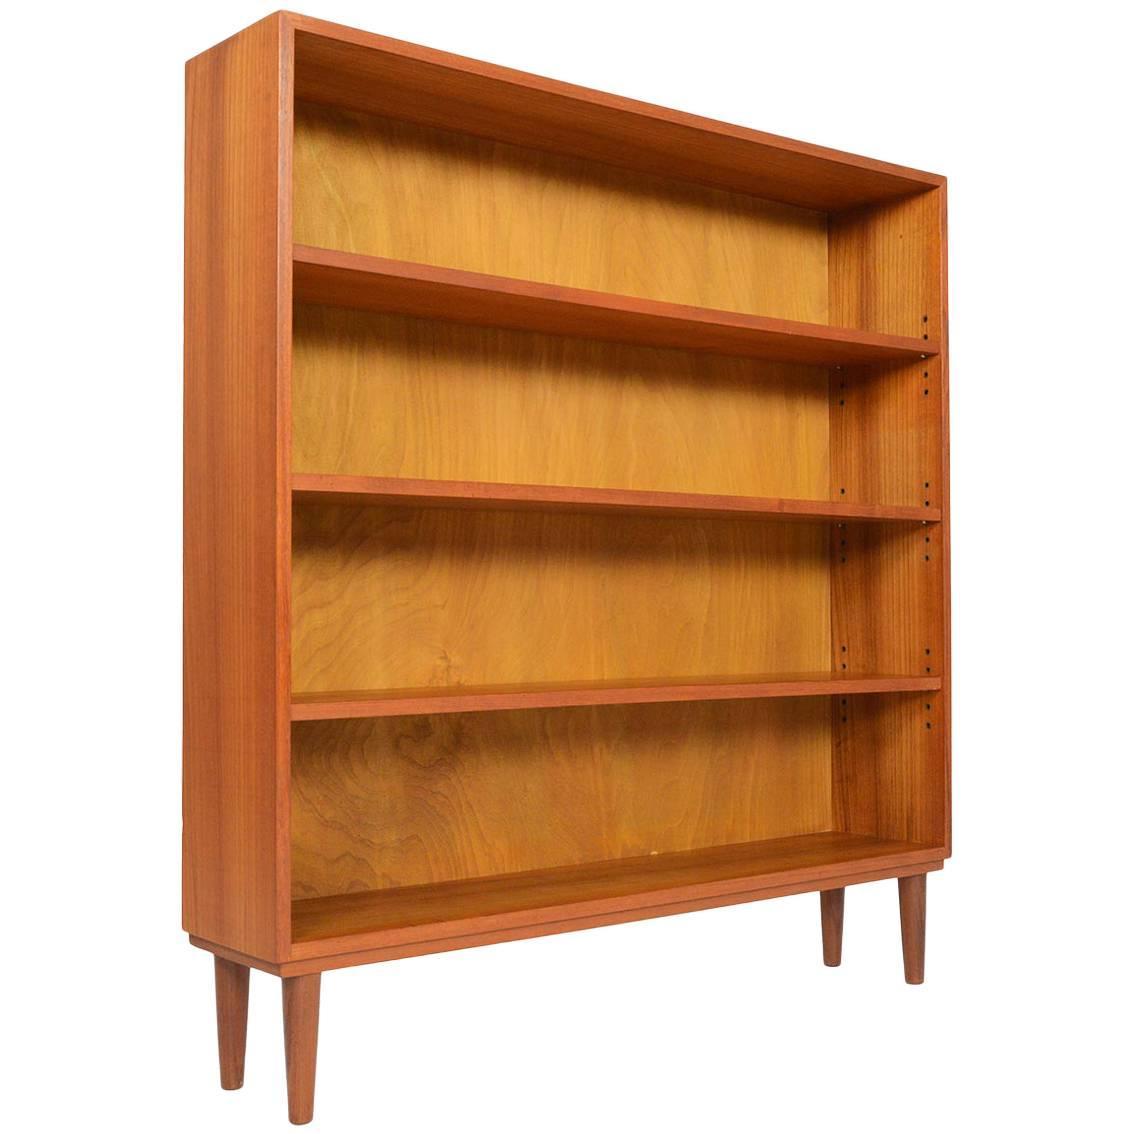 narrow danish modern midcentury bookcase in teak 1